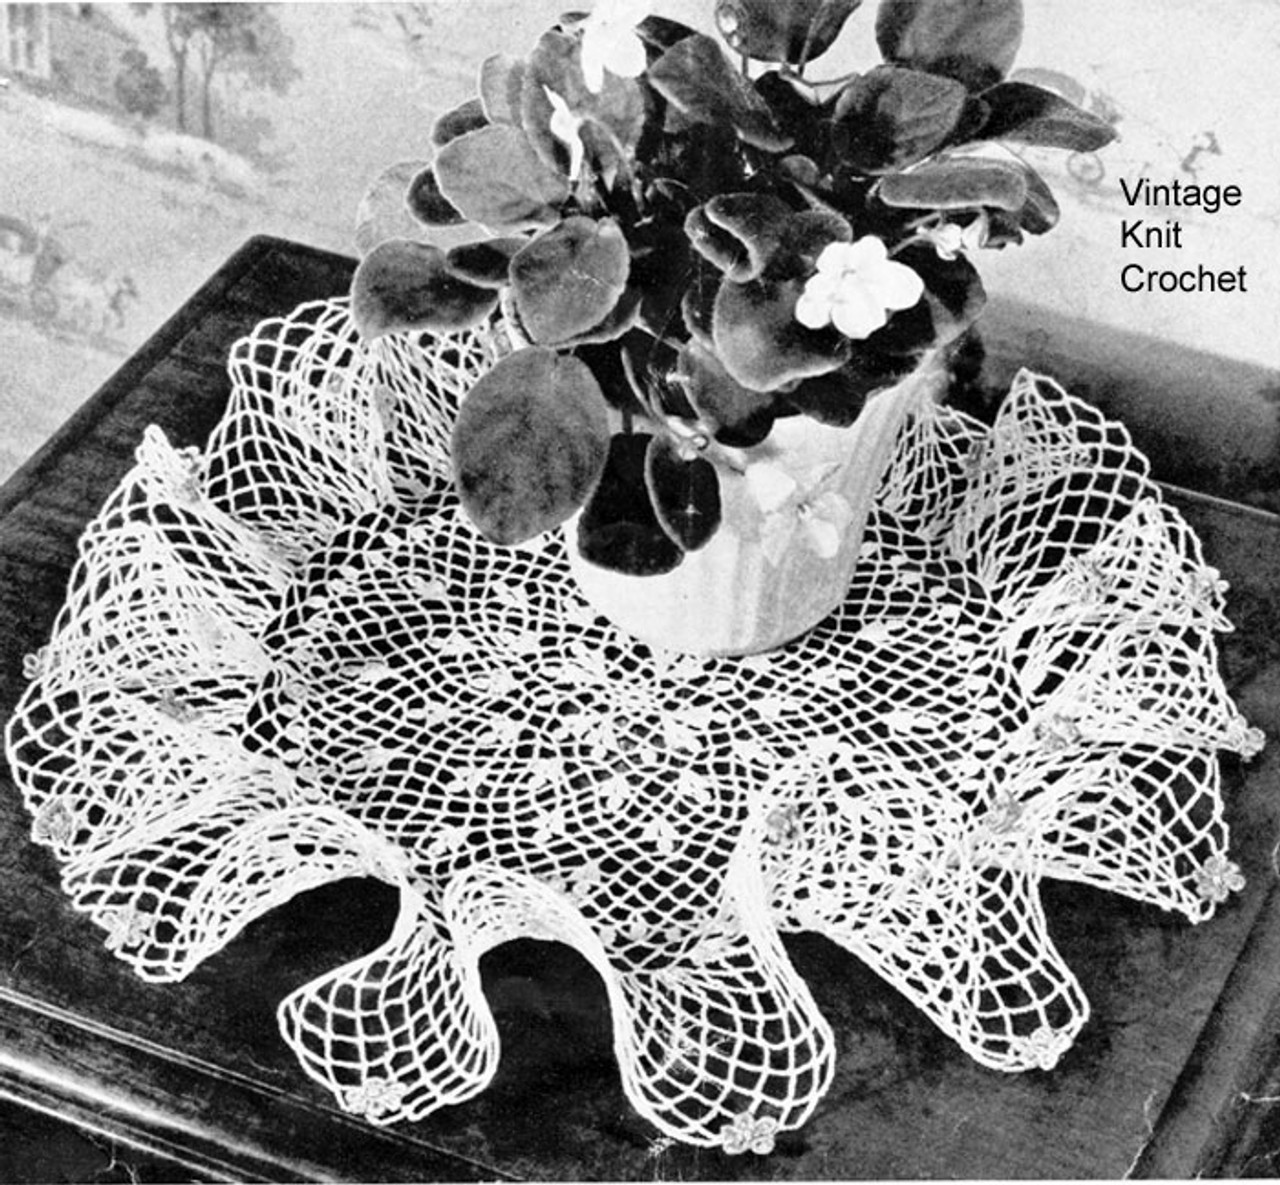 Vintage Ruffled African Violet Doily Patter